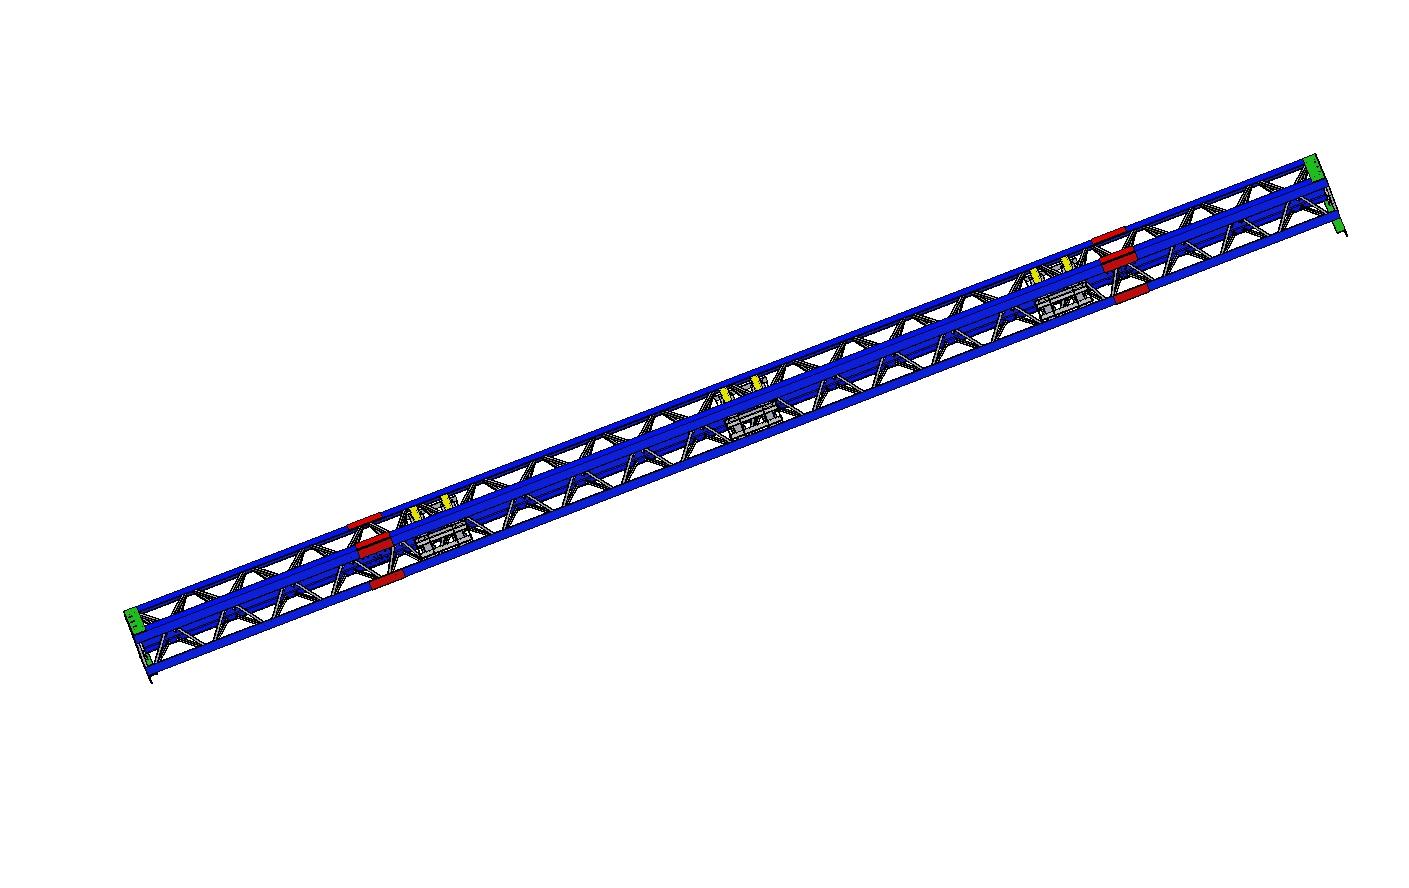 Konstruktionsb ro g deker for Maschinenbau statik